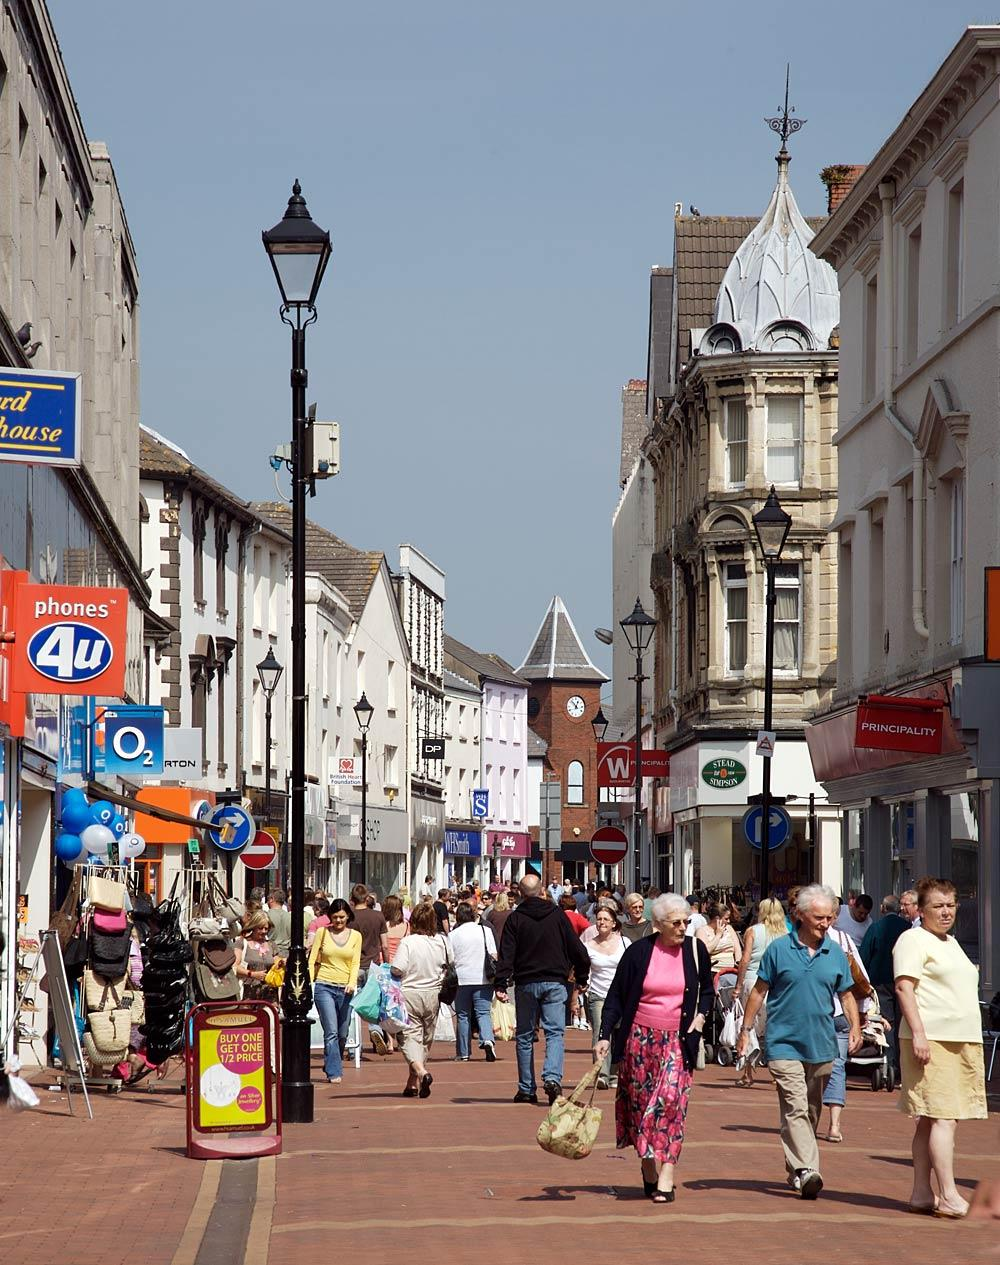 Wind Street, Neath